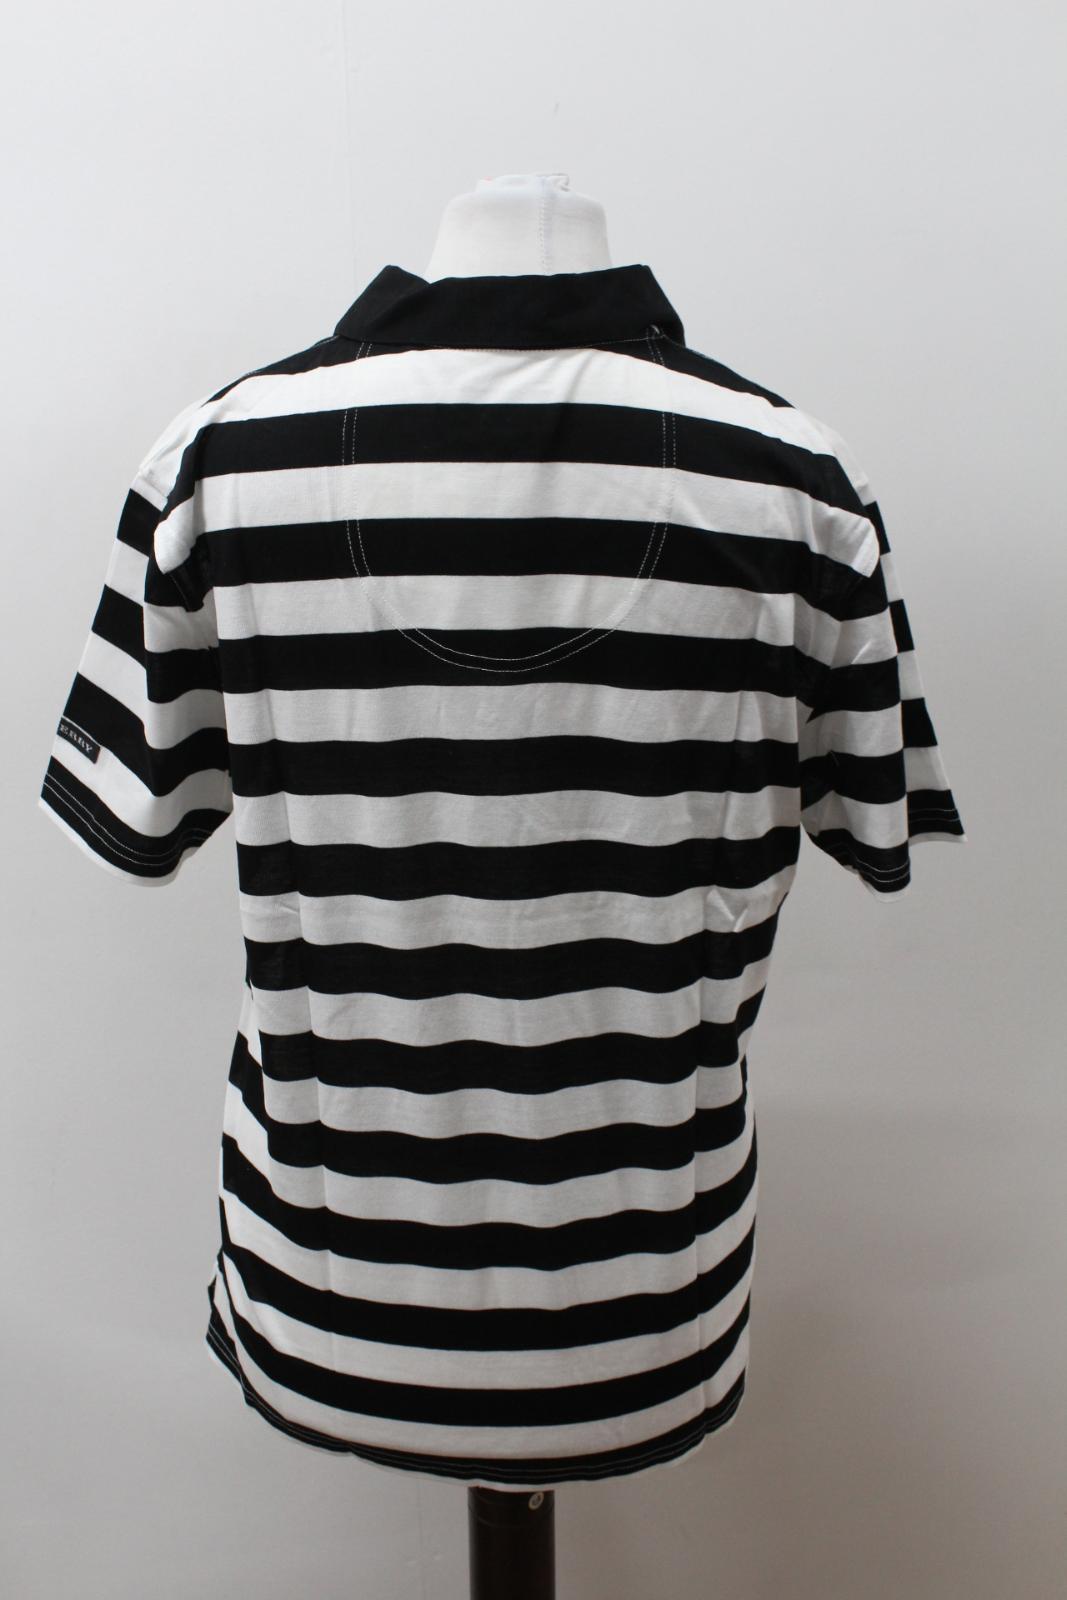 BURBERRY-GOLF-Ladies-Black-White-Cotton-Short-Sleeve-Striped-Polo-Shirt-S-BNWT thumbnail 5